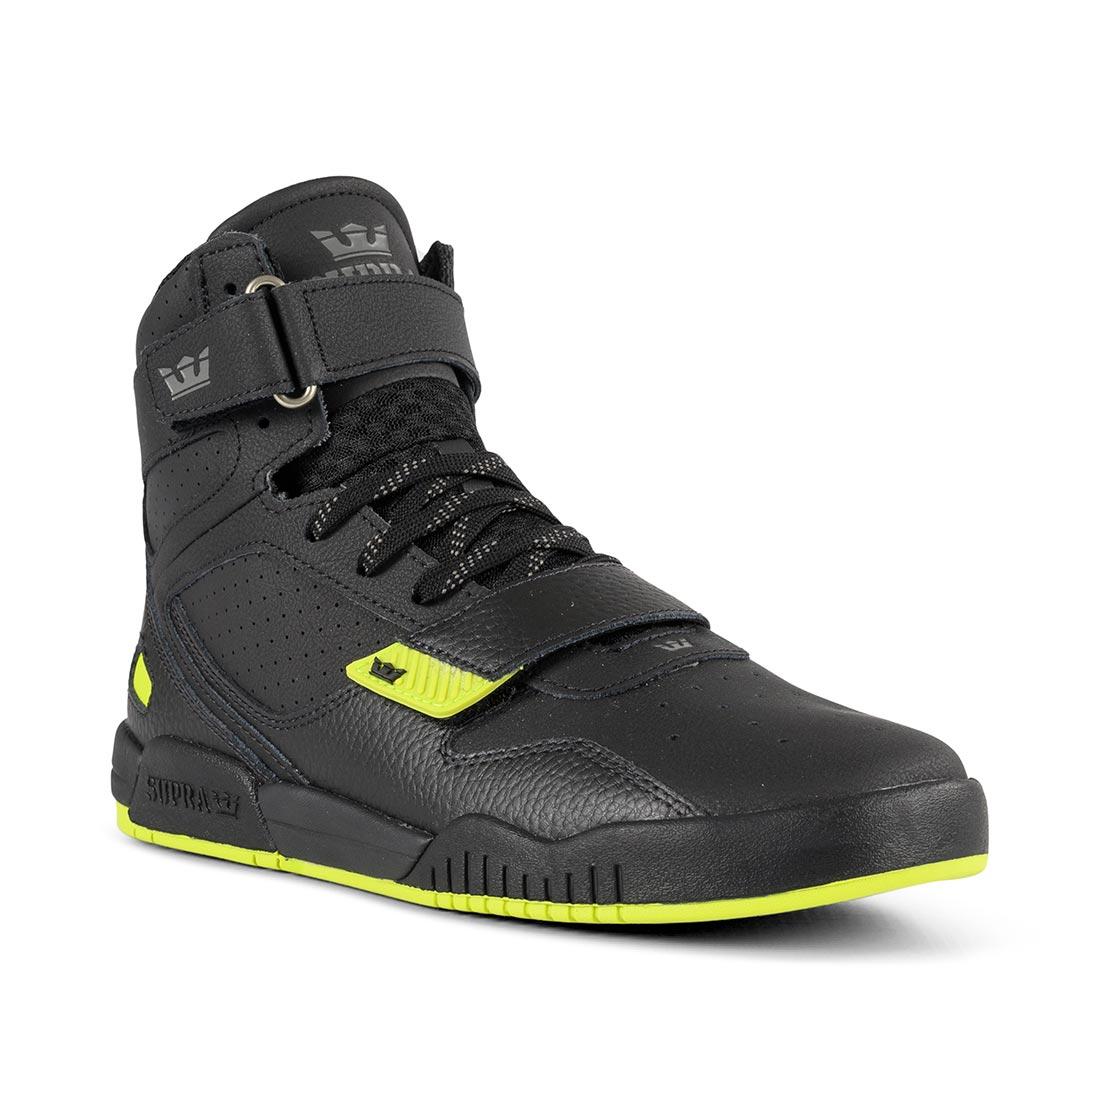 Supra Breaker High Top Shoes - Black